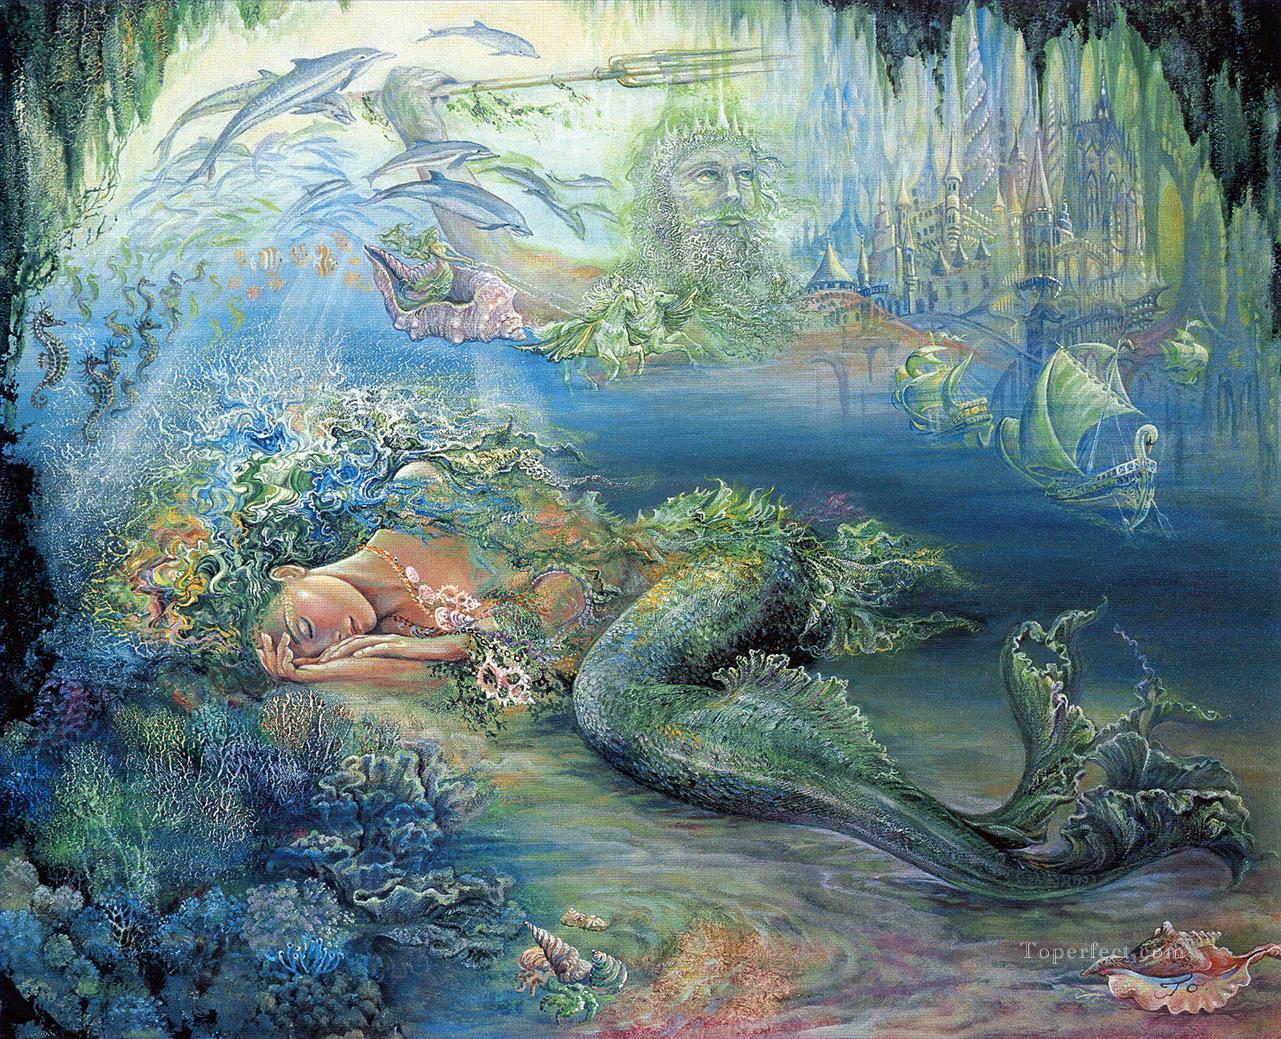 JW dreams of atlantis Fantasy Painting in Oil for Sale